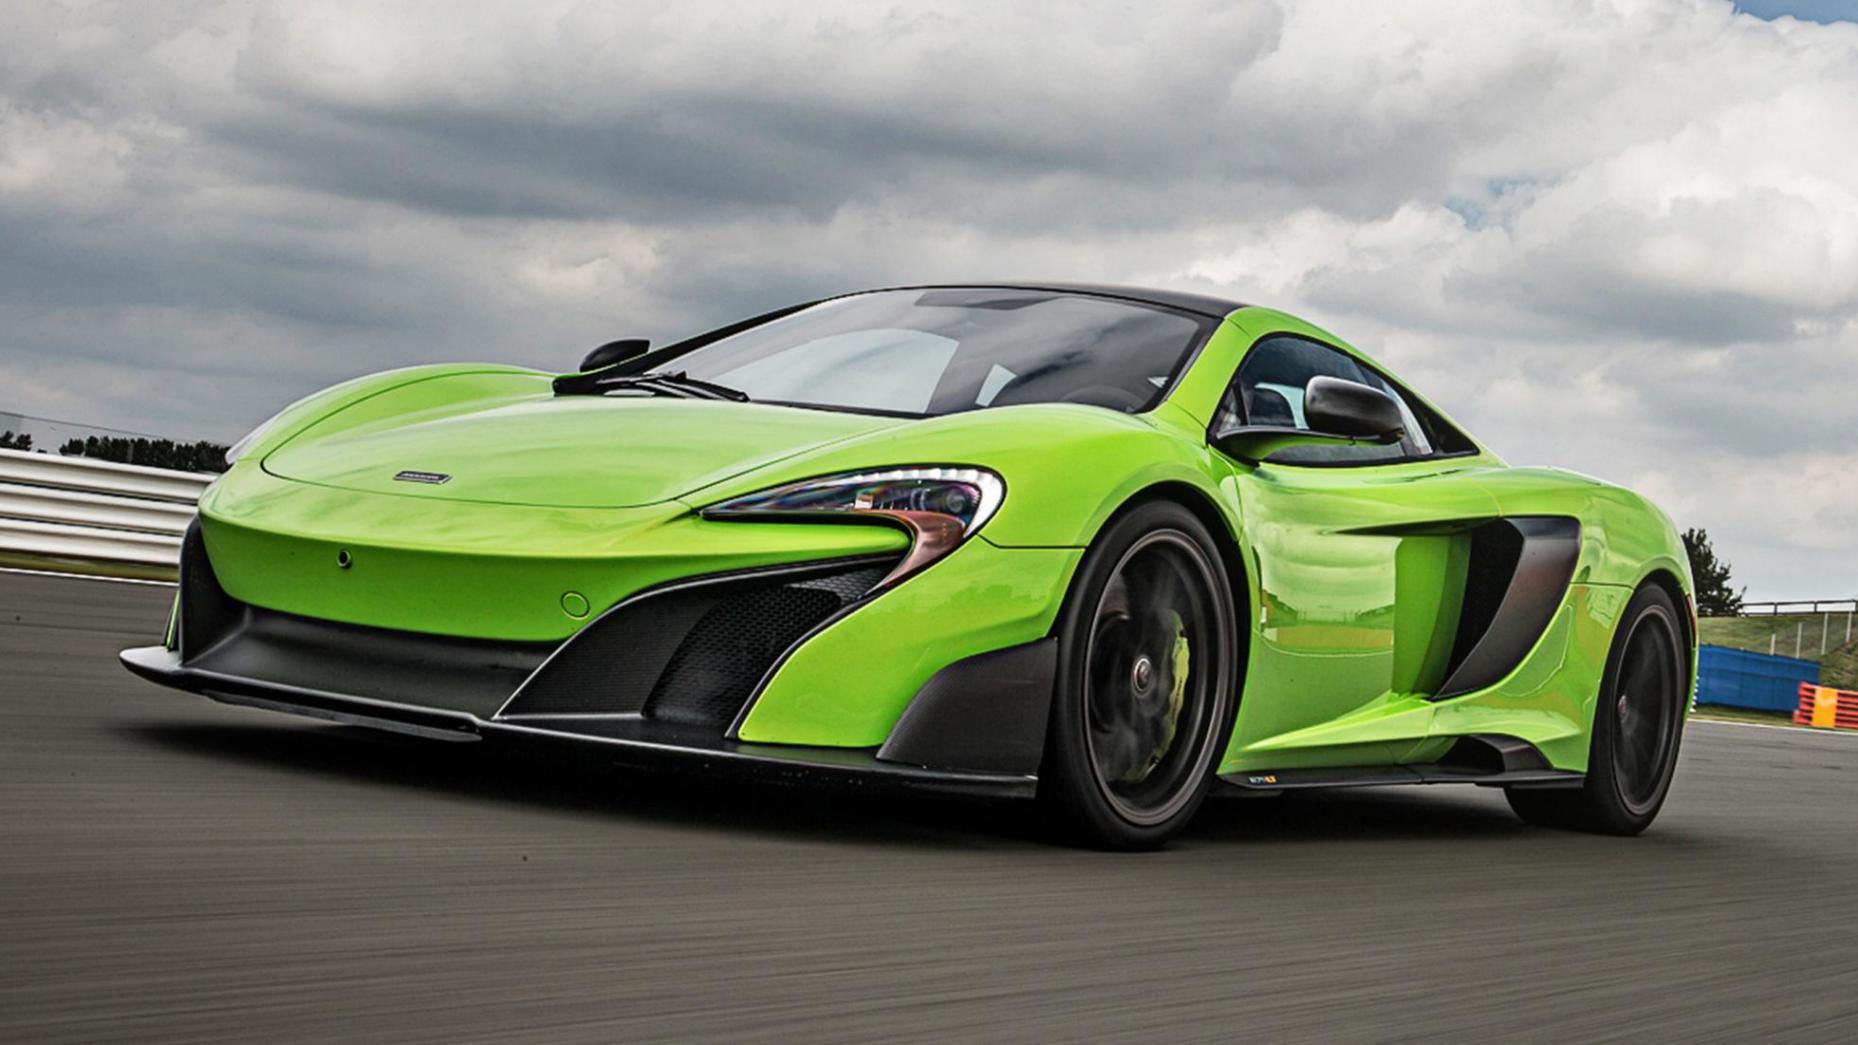 11-McLaren 675LT 666bhp, 205mph